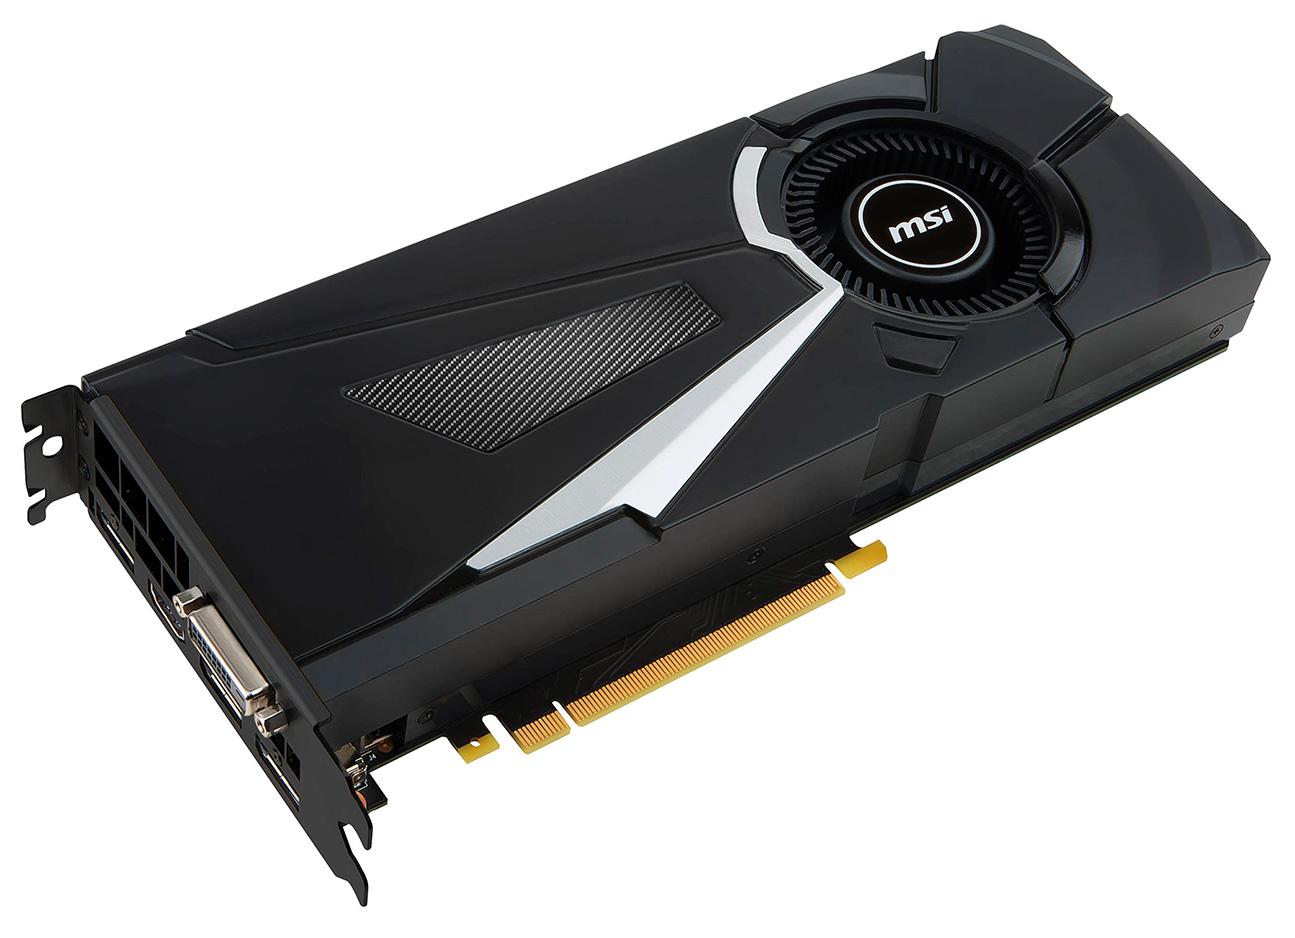 MSI GTX 1080 Aero